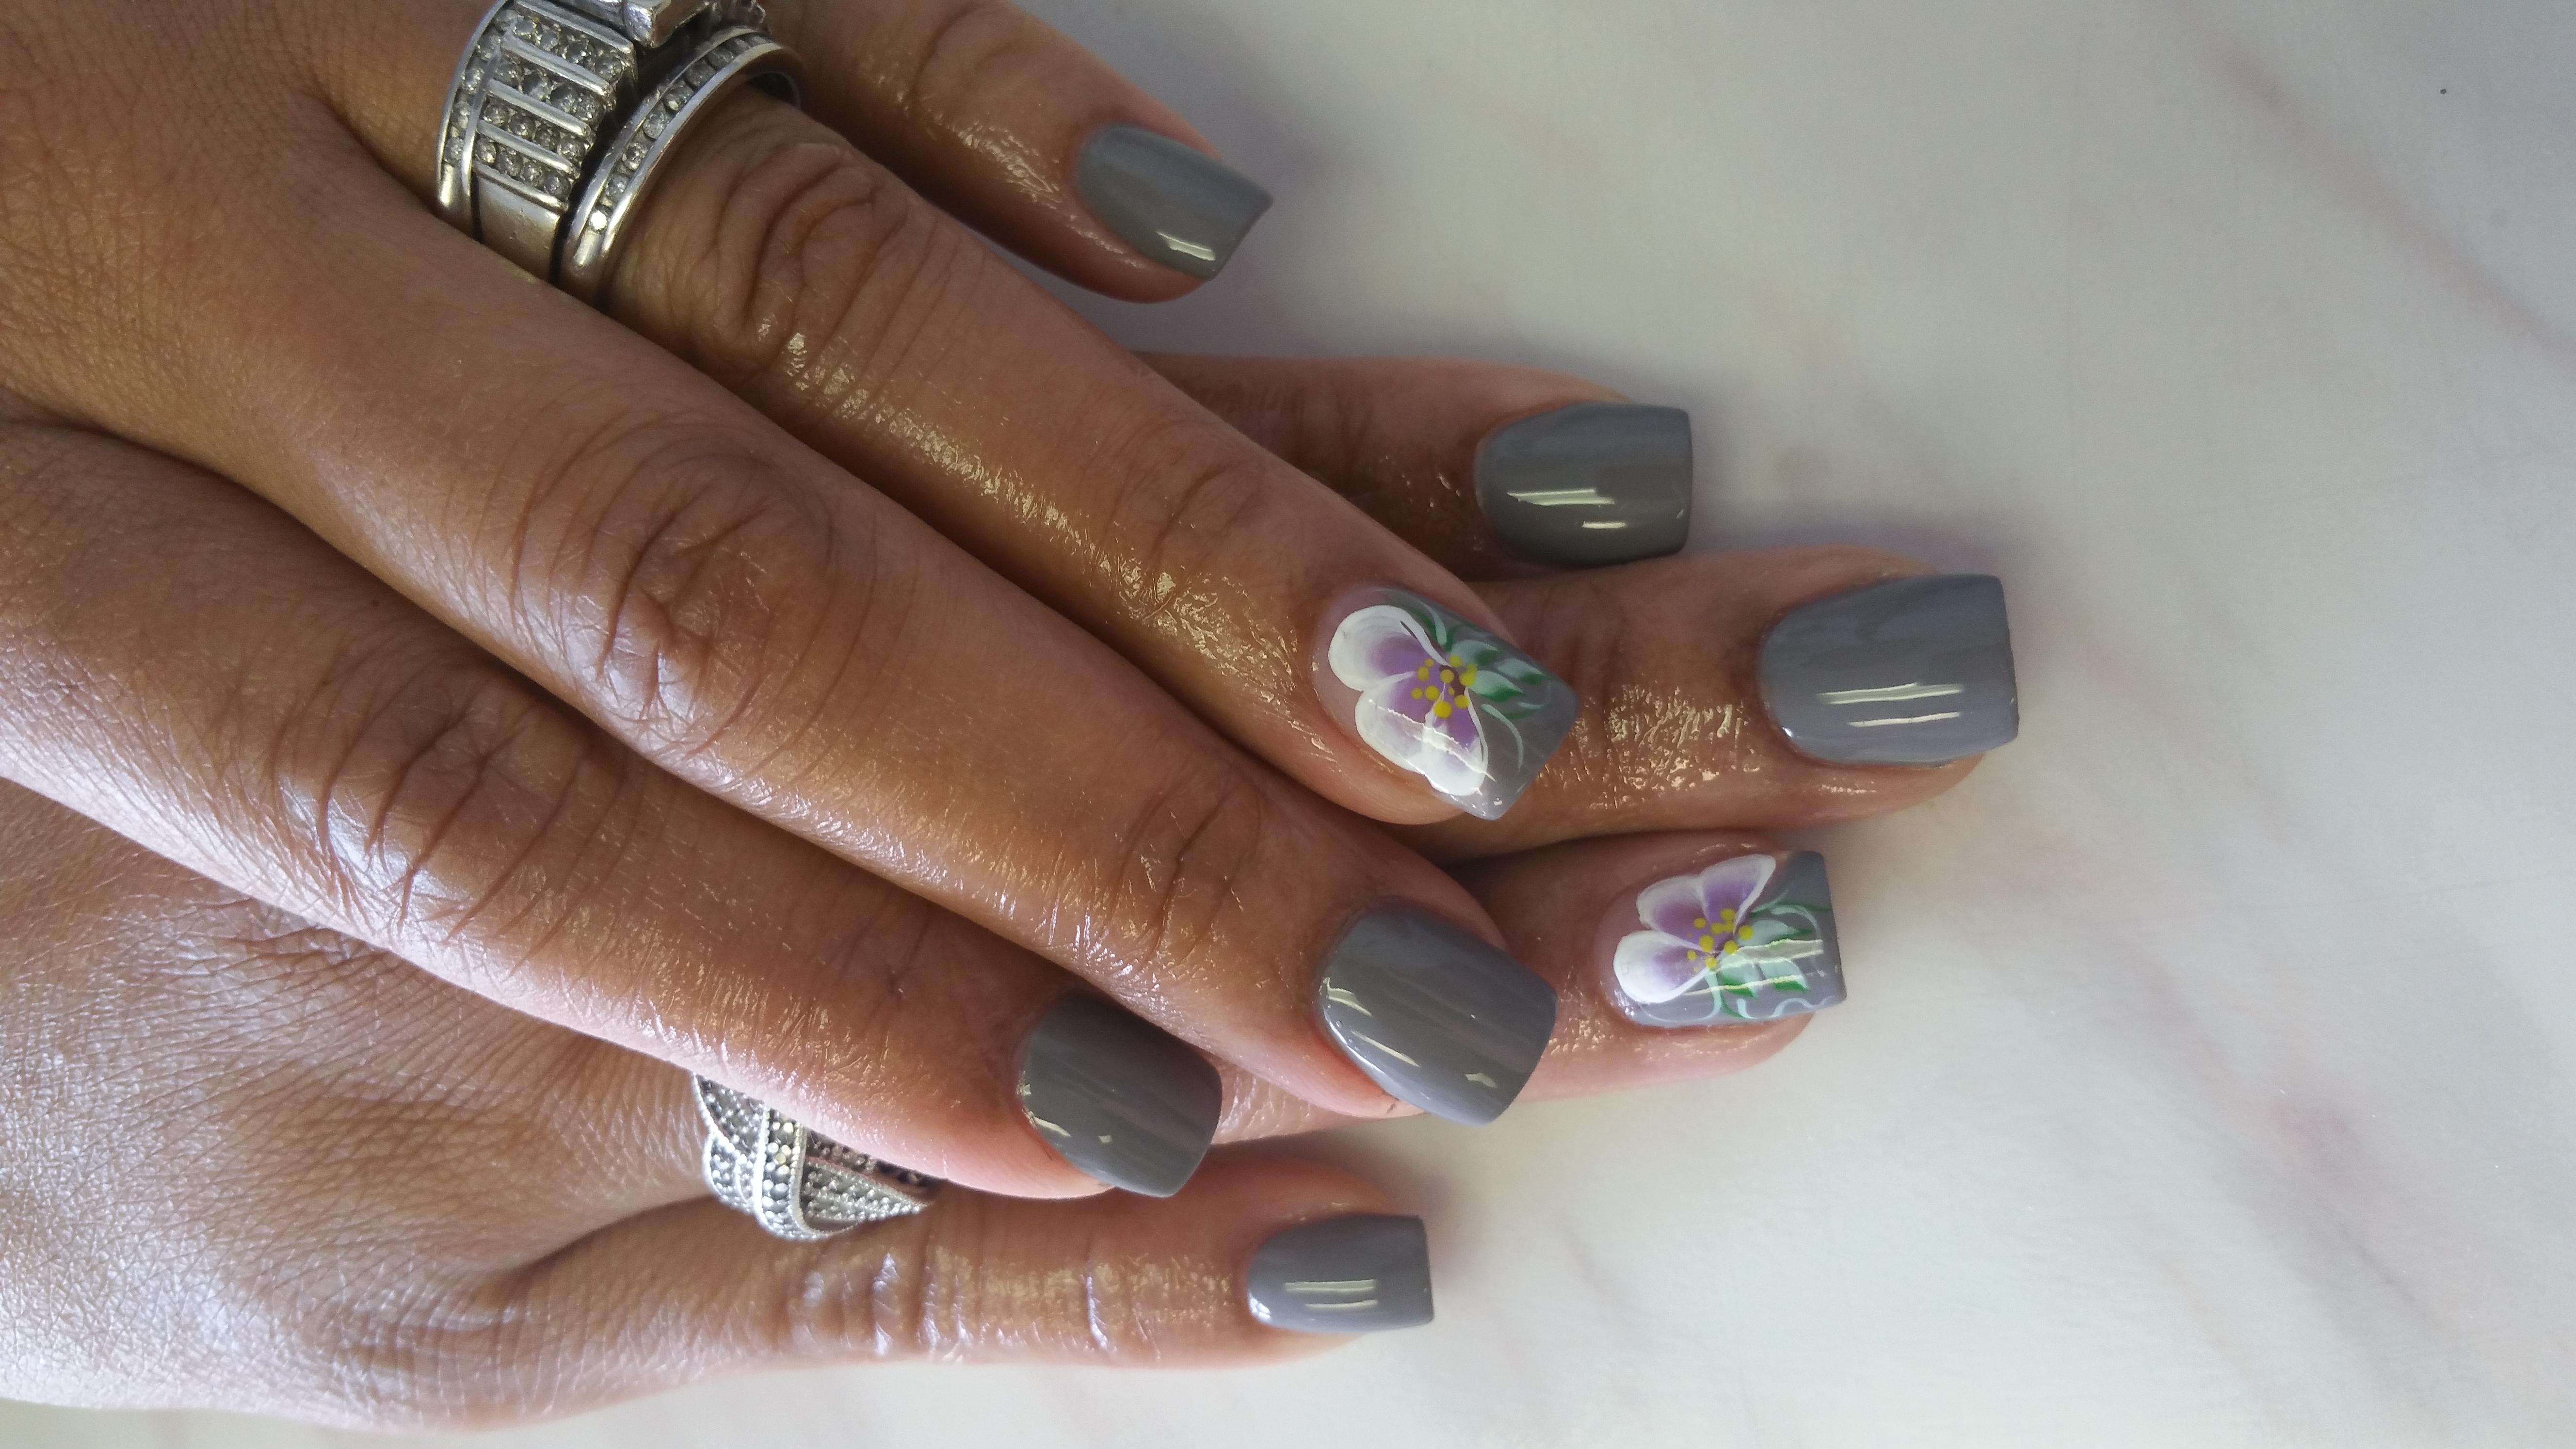 Dianas Professional Nail Care 8131 Parallel Pkwy Kansas City Ks